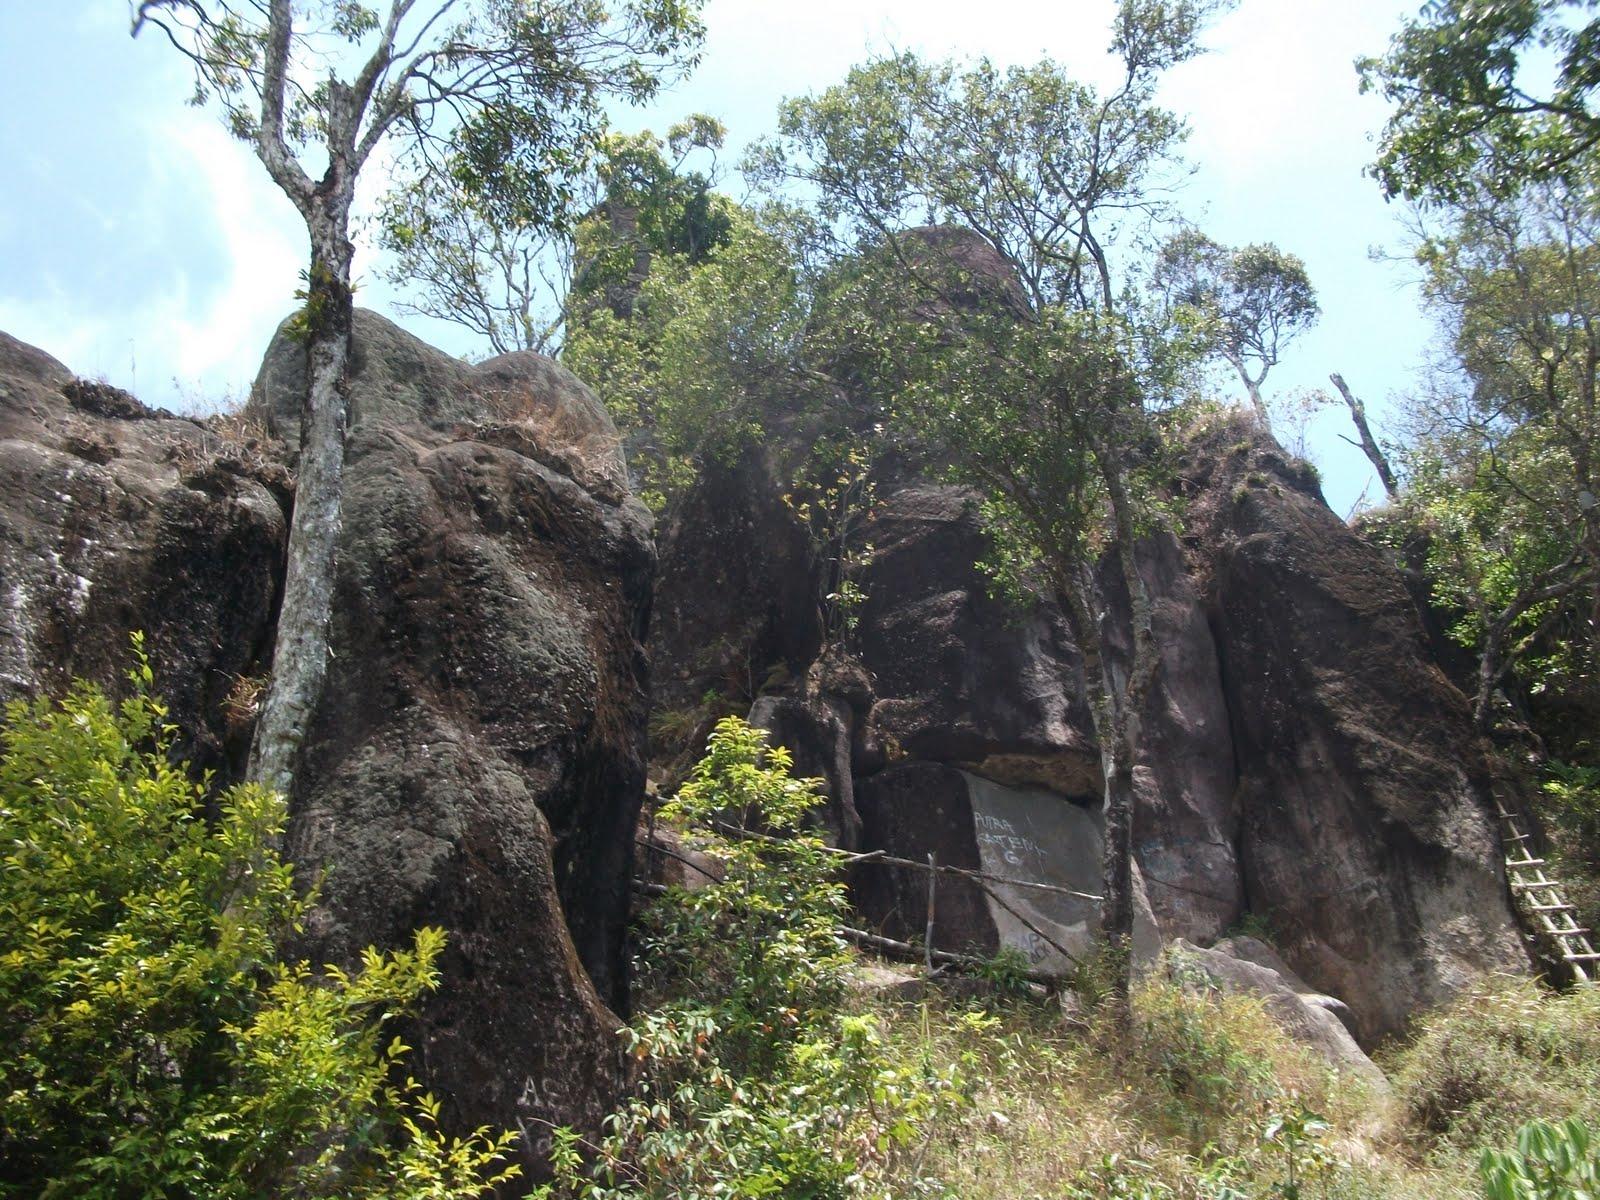 Makam Linggaratu